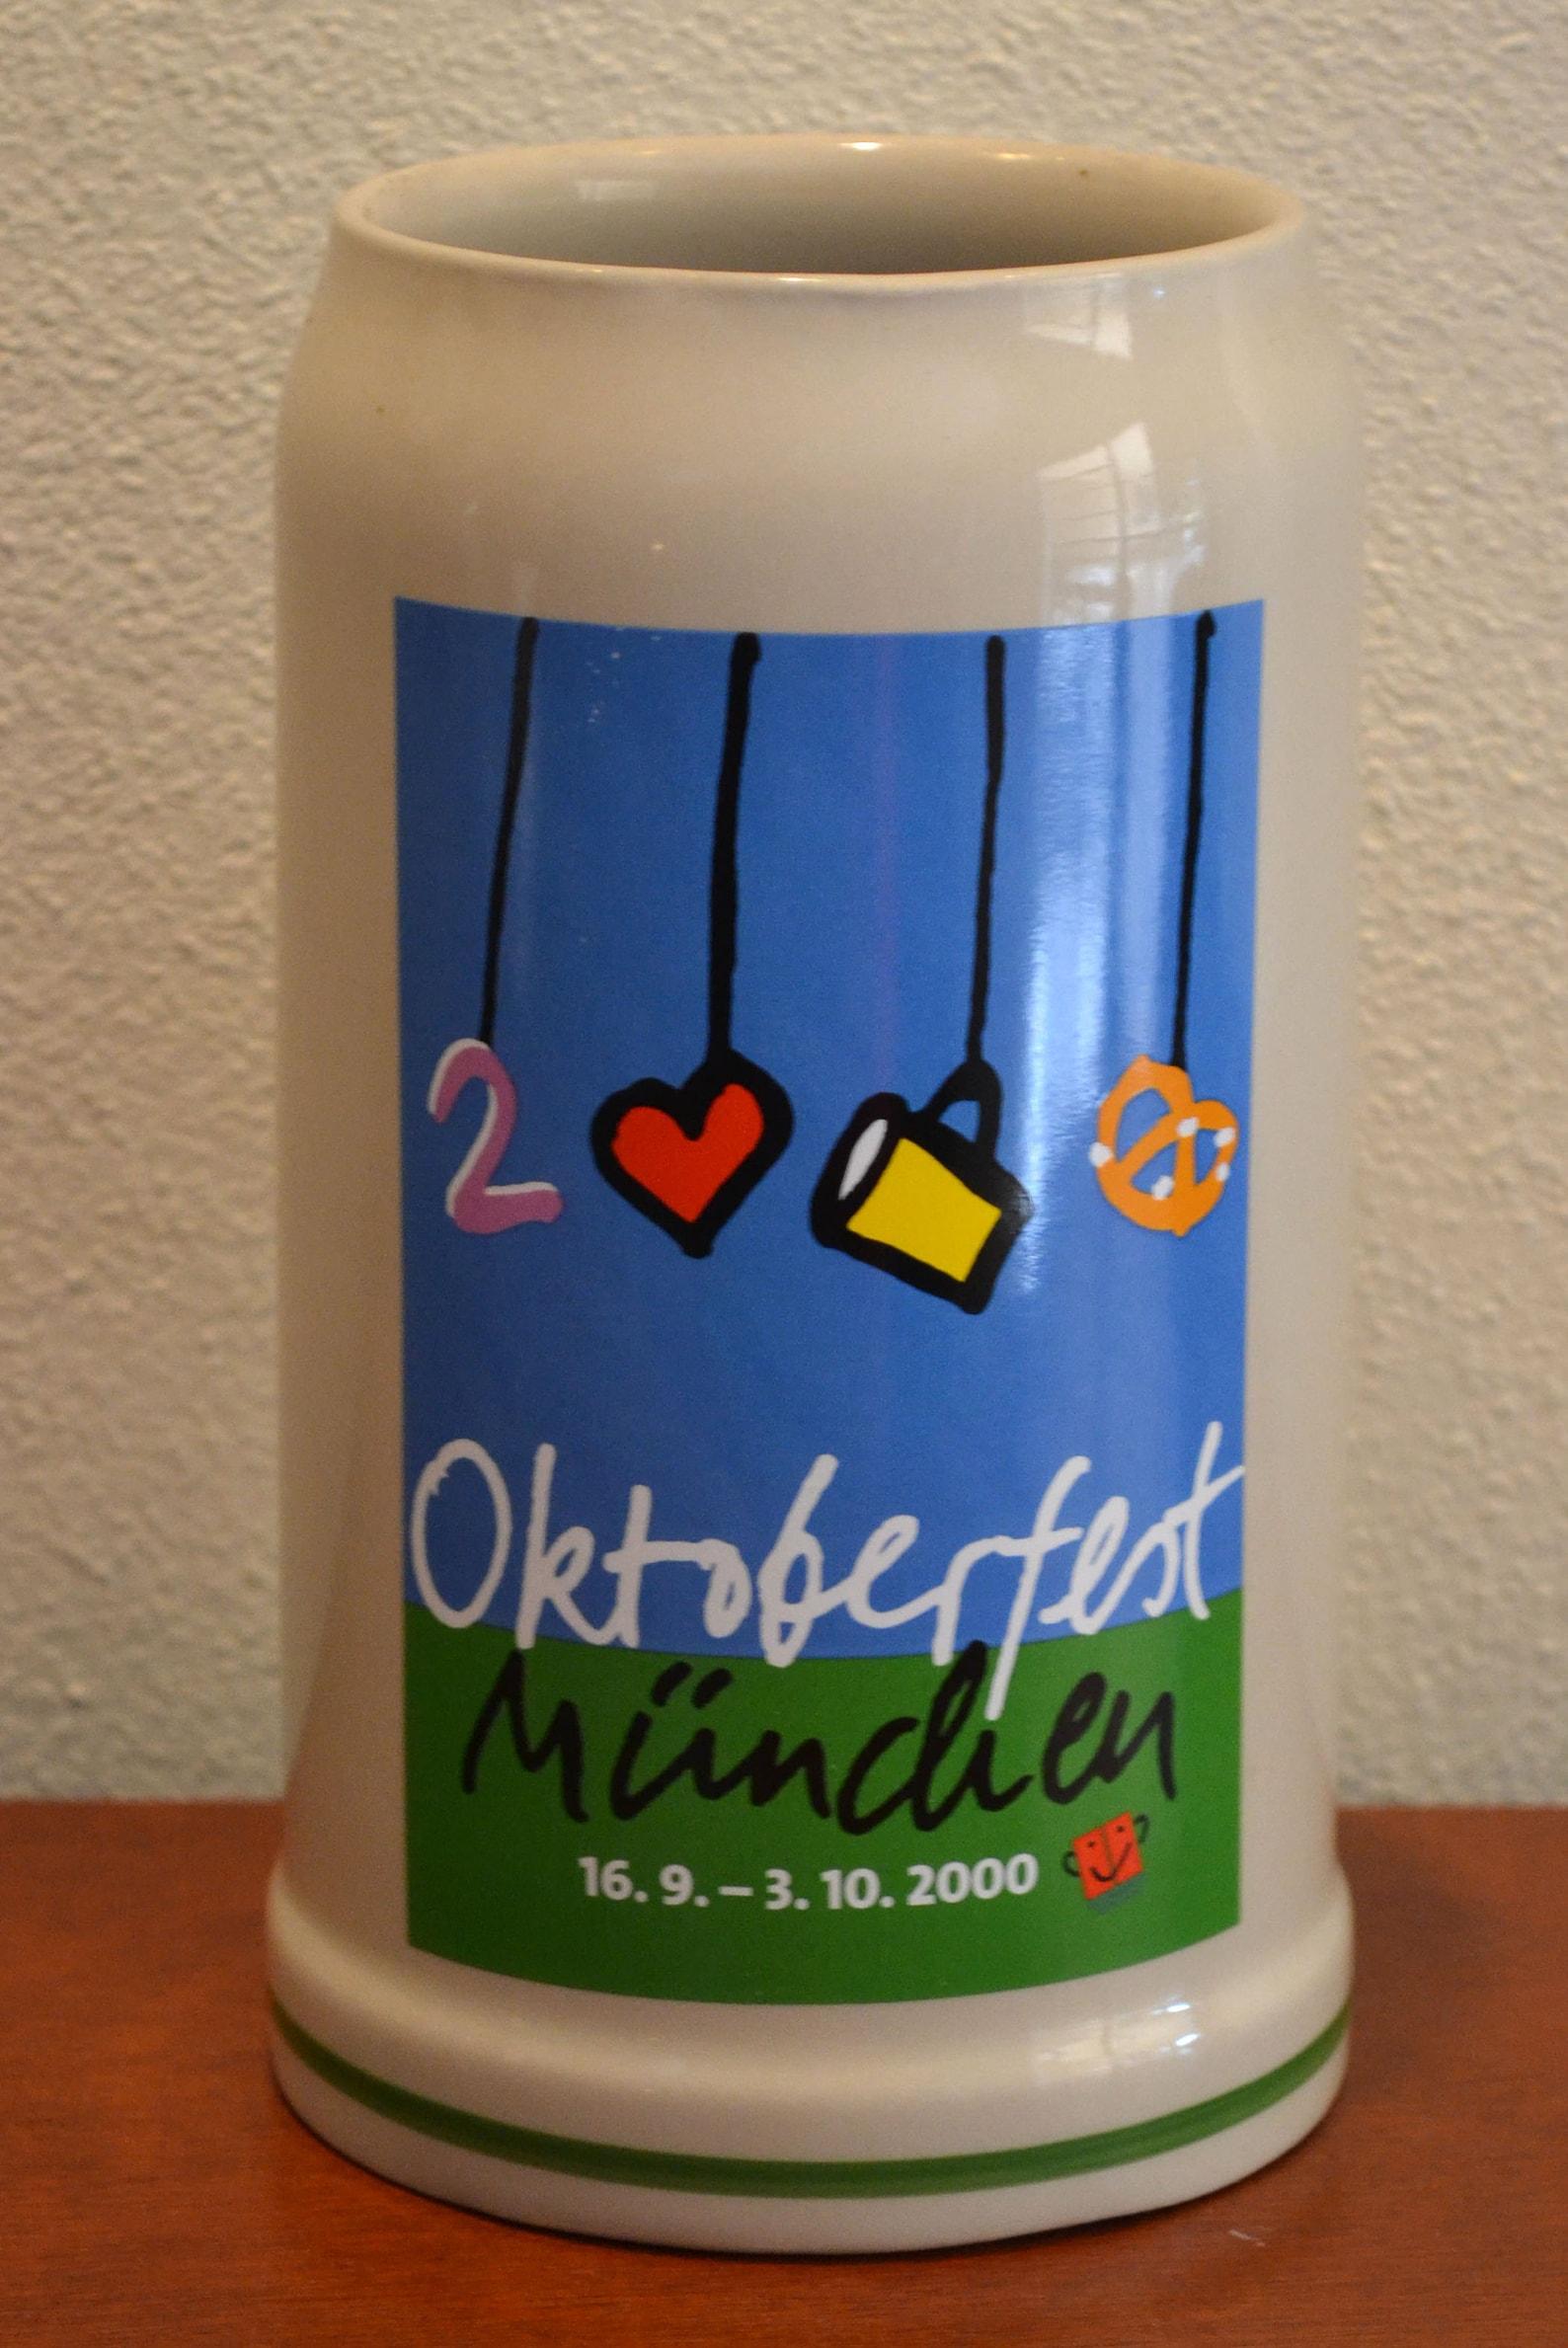 Official 2000 Munich OCTOBERFEST Beer Stein Mug (MUNCHEN OKTOBERFEST) by Rastal